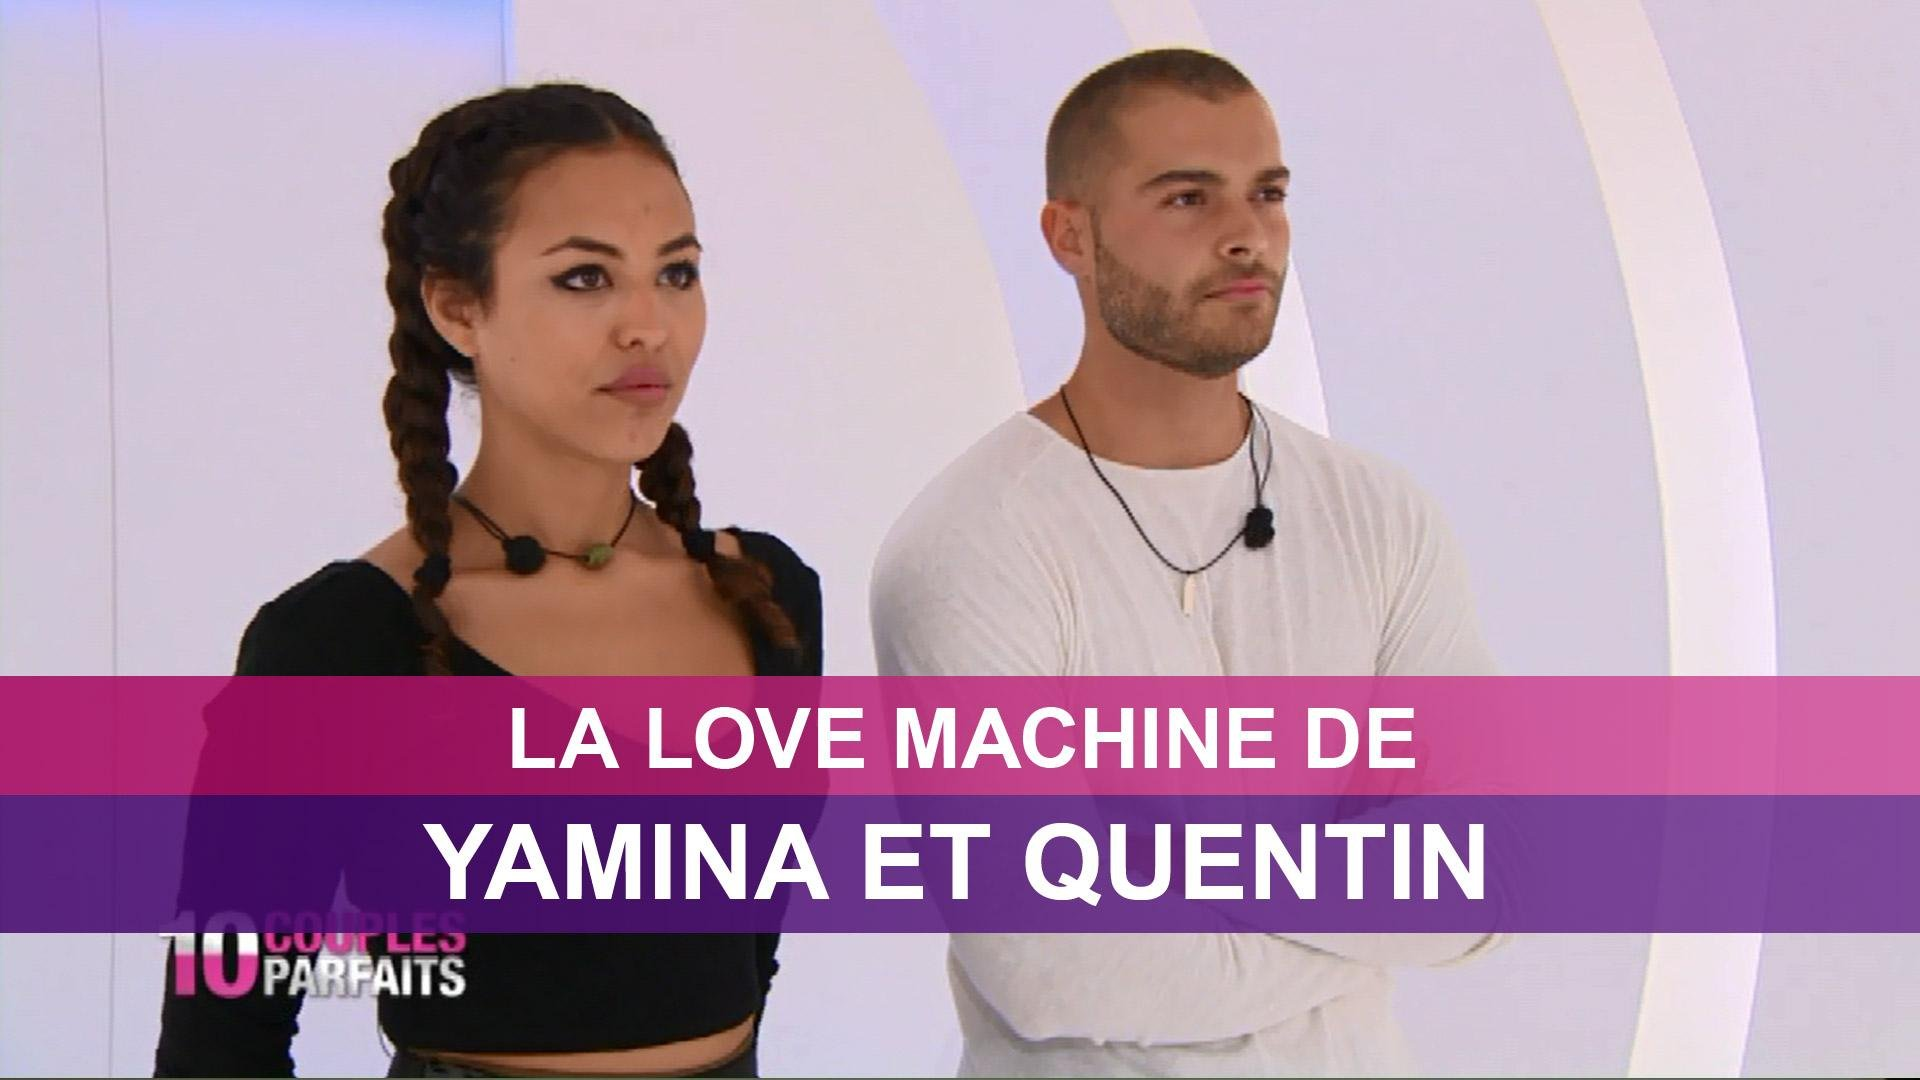 10-couples-parfaits-love-machine-de-yamina-quentin-9b40bf-0@1x.jpeg (1920×1080)